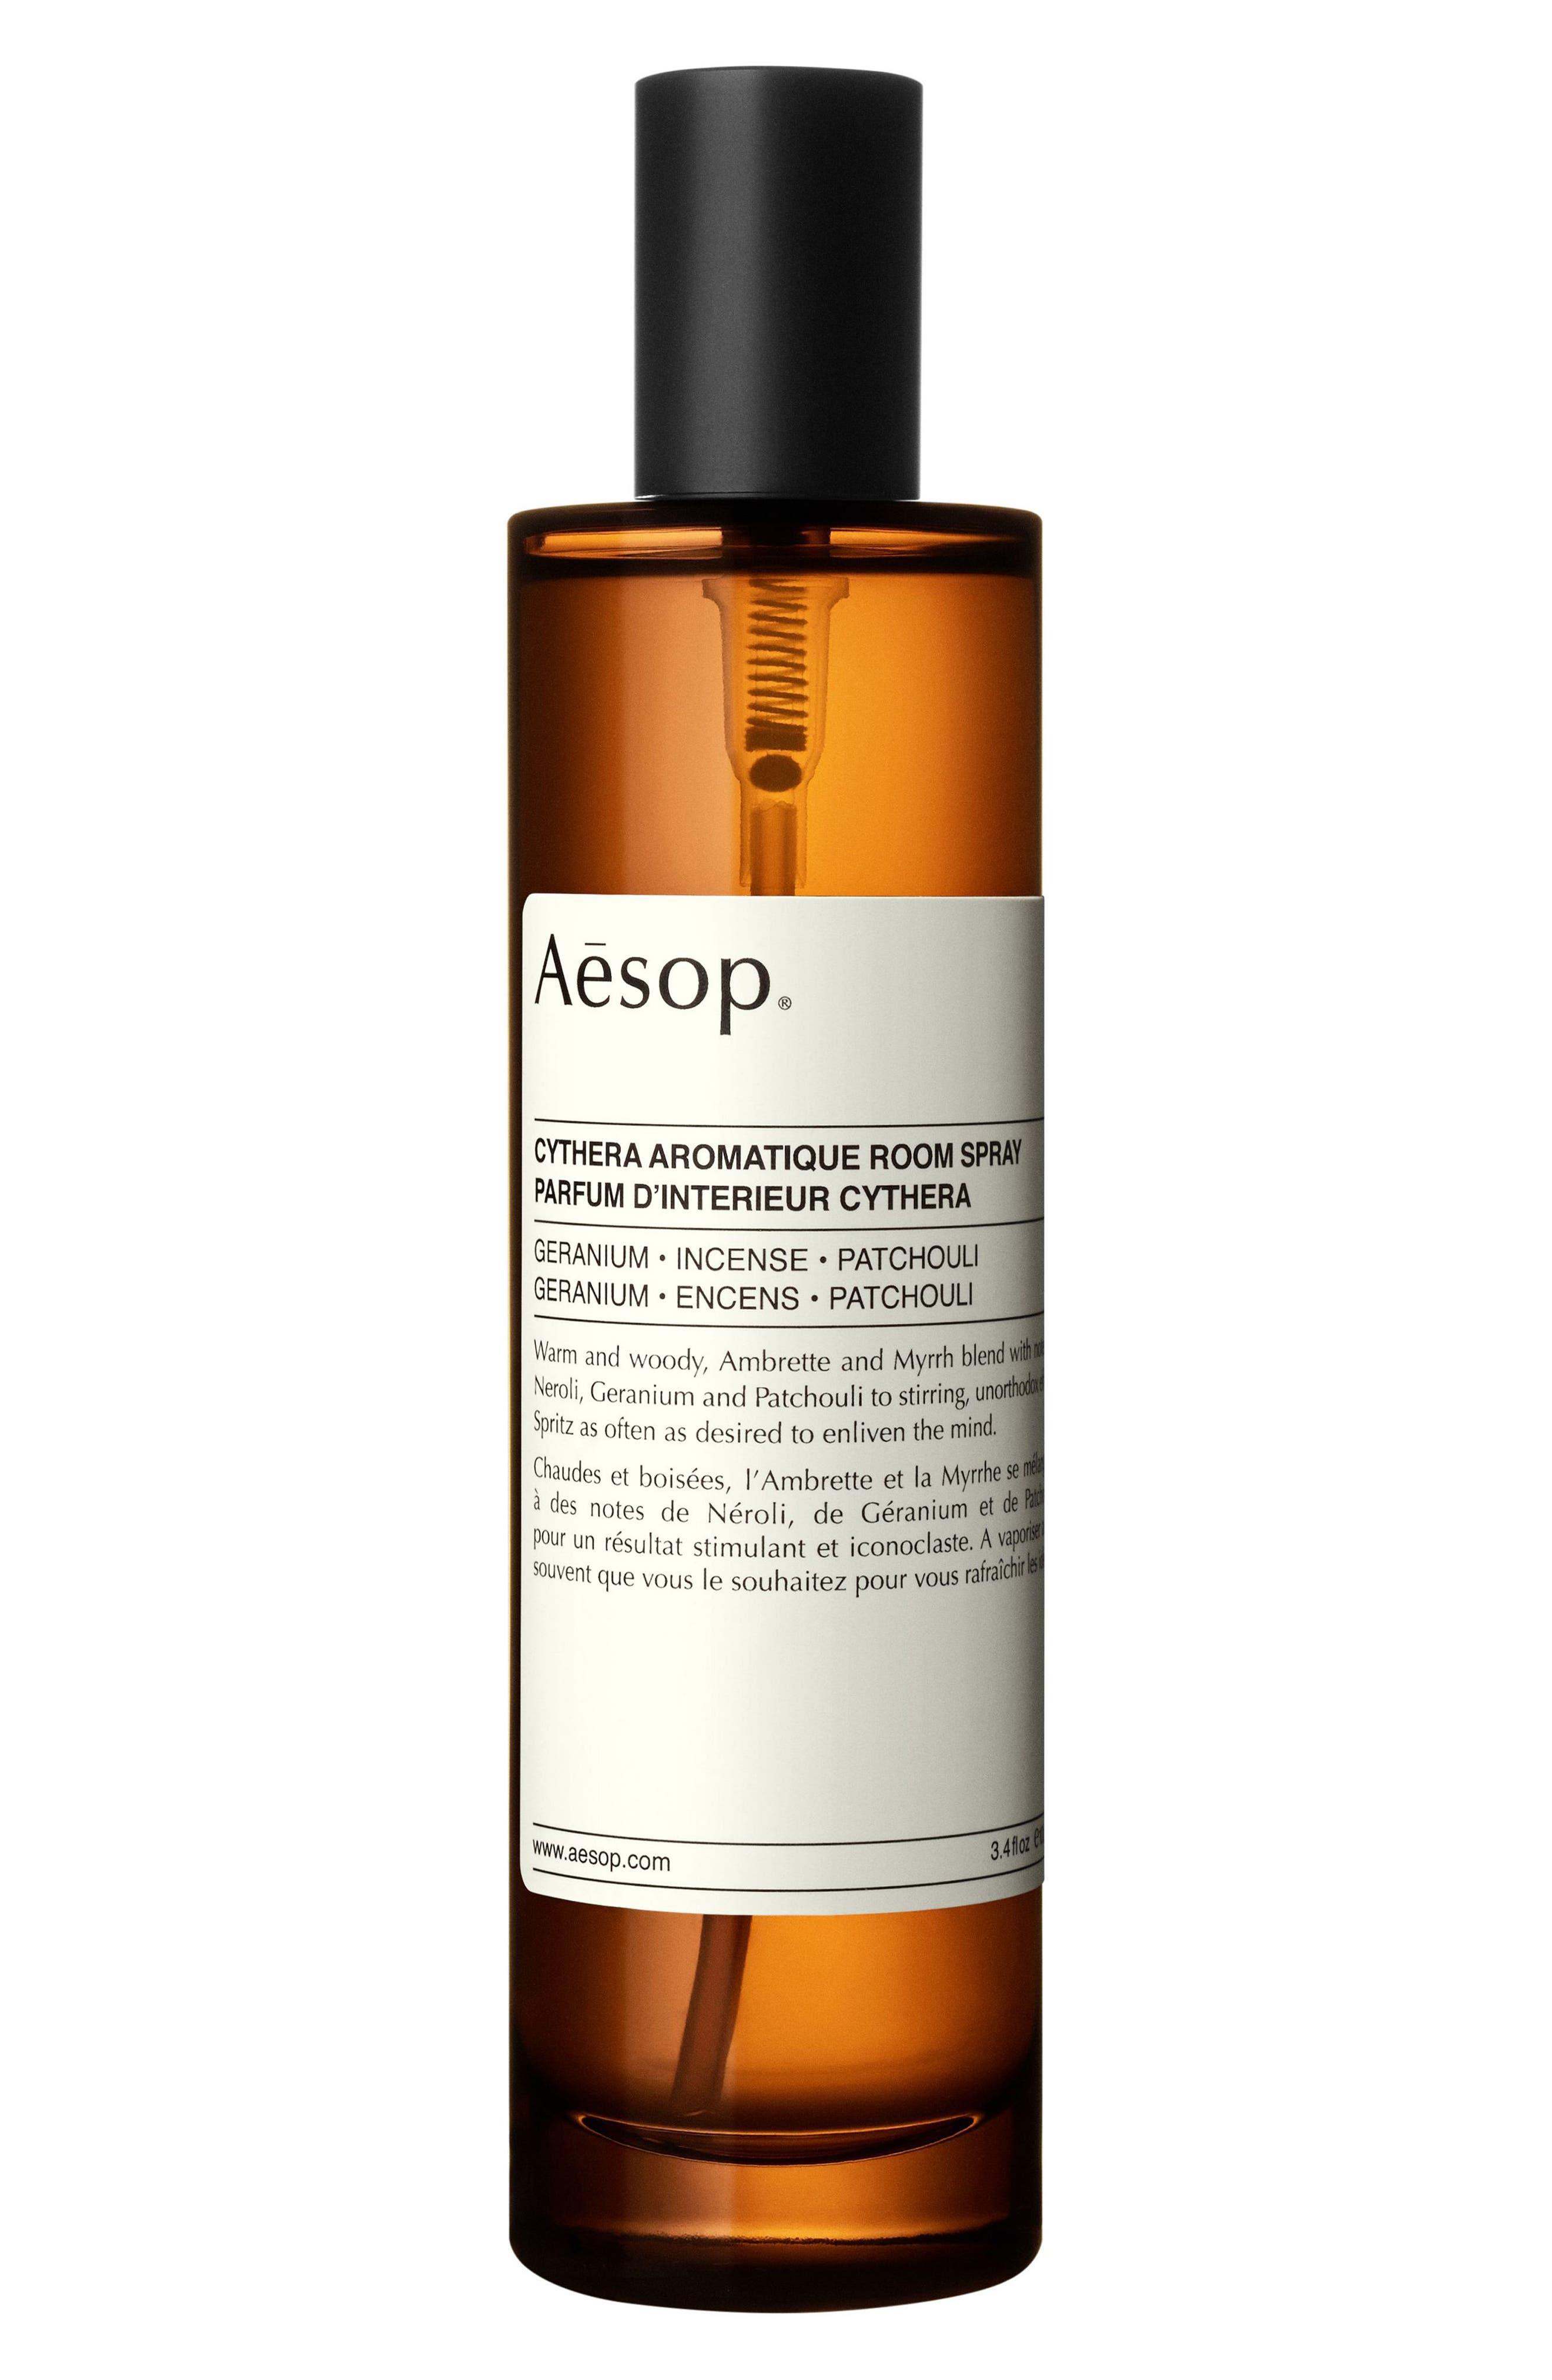 Aesop Aromatique Room Spray